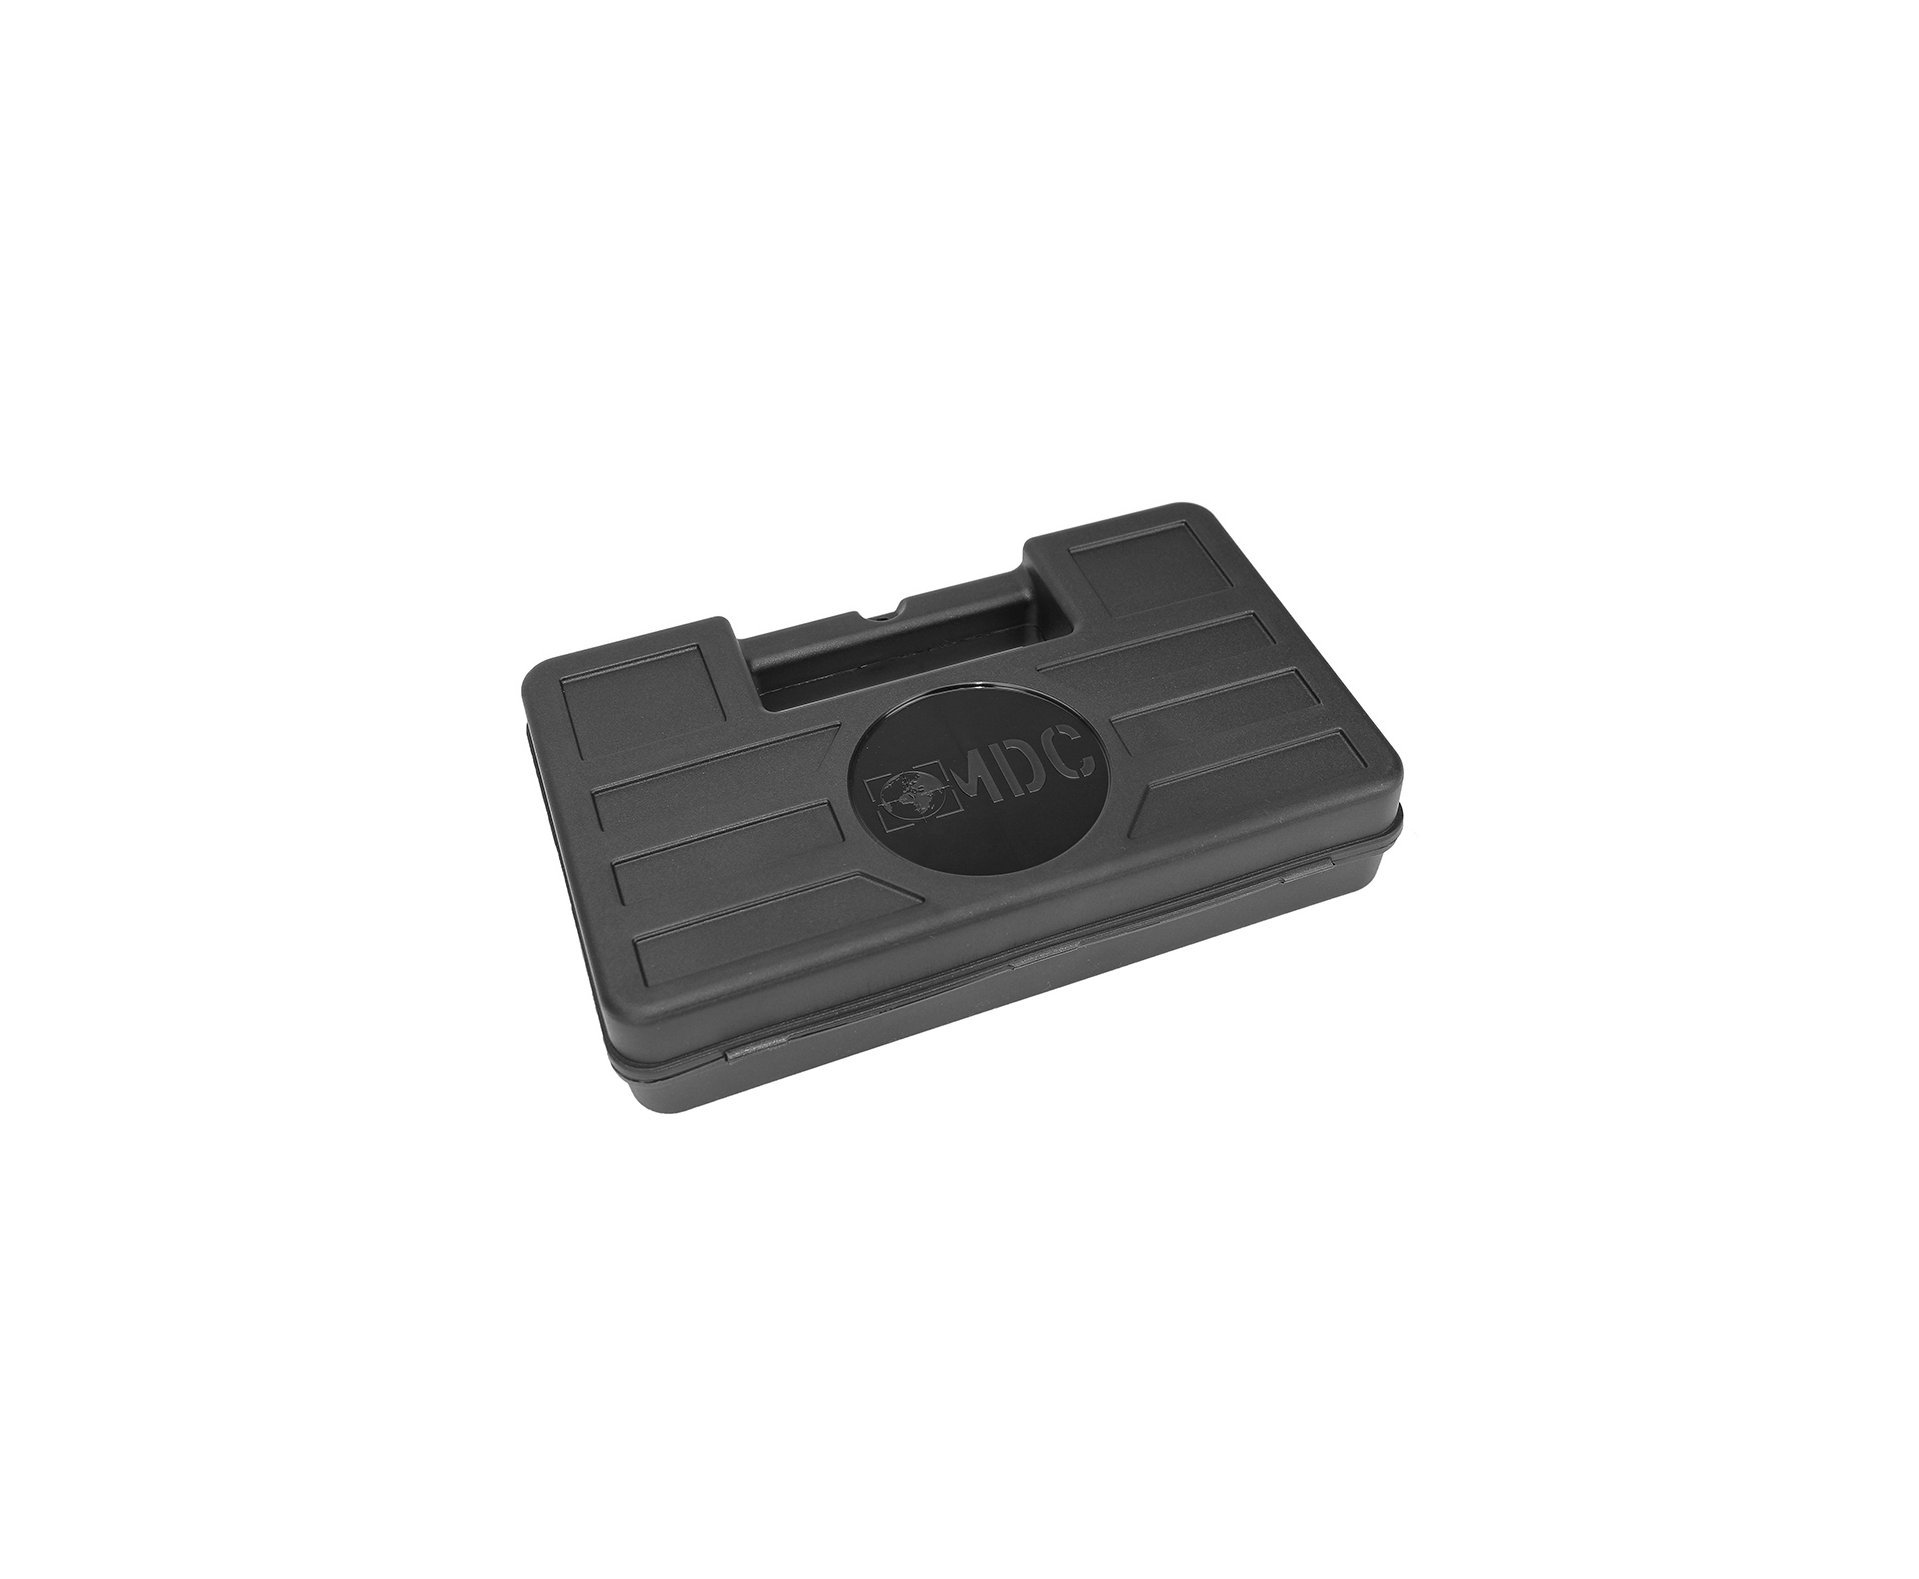 Pistola De Airsoft Taurus Pt 24/7 Semi/metal Cal 6,0 Mm + 4000 Esferas Plásticas 0,12g + Case - Cyber Gun